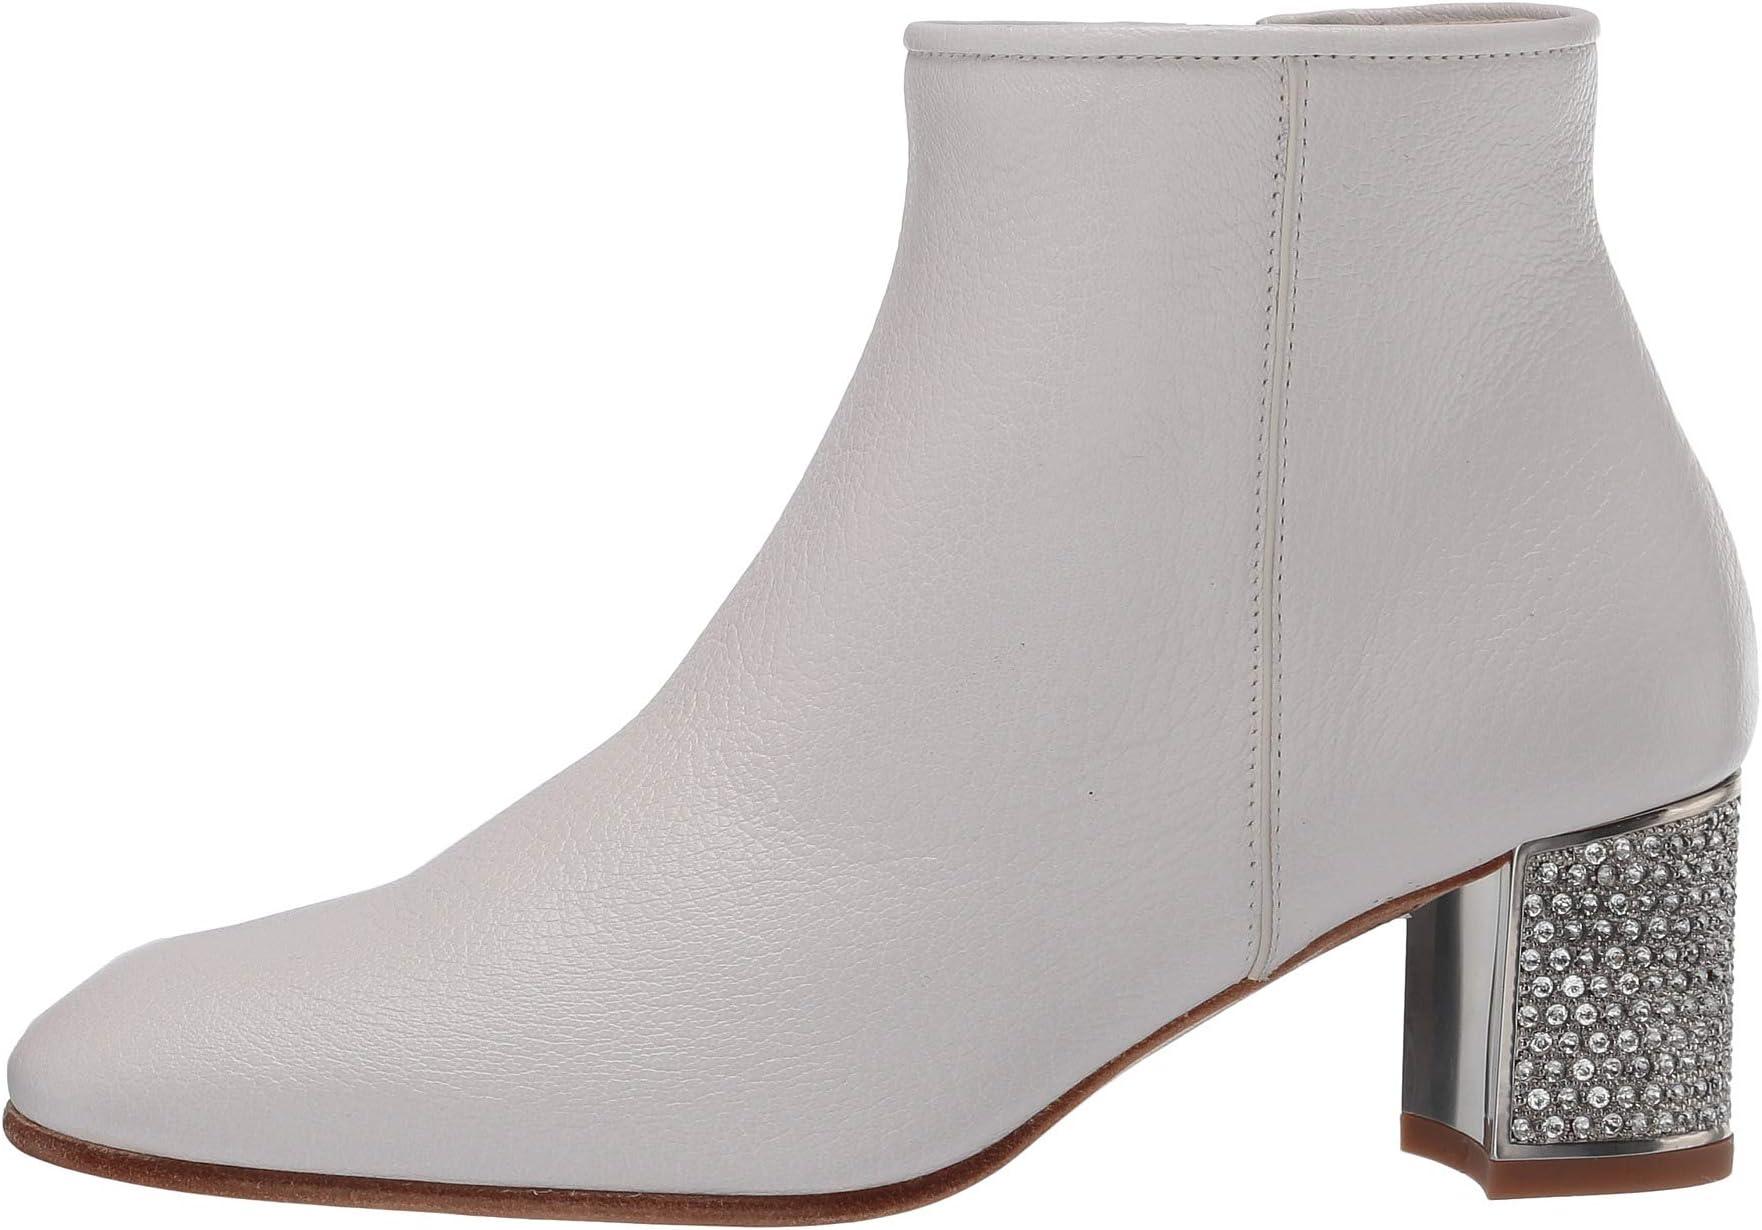 Pedro Garcia Xamira   Women's shoes   2020 Newest